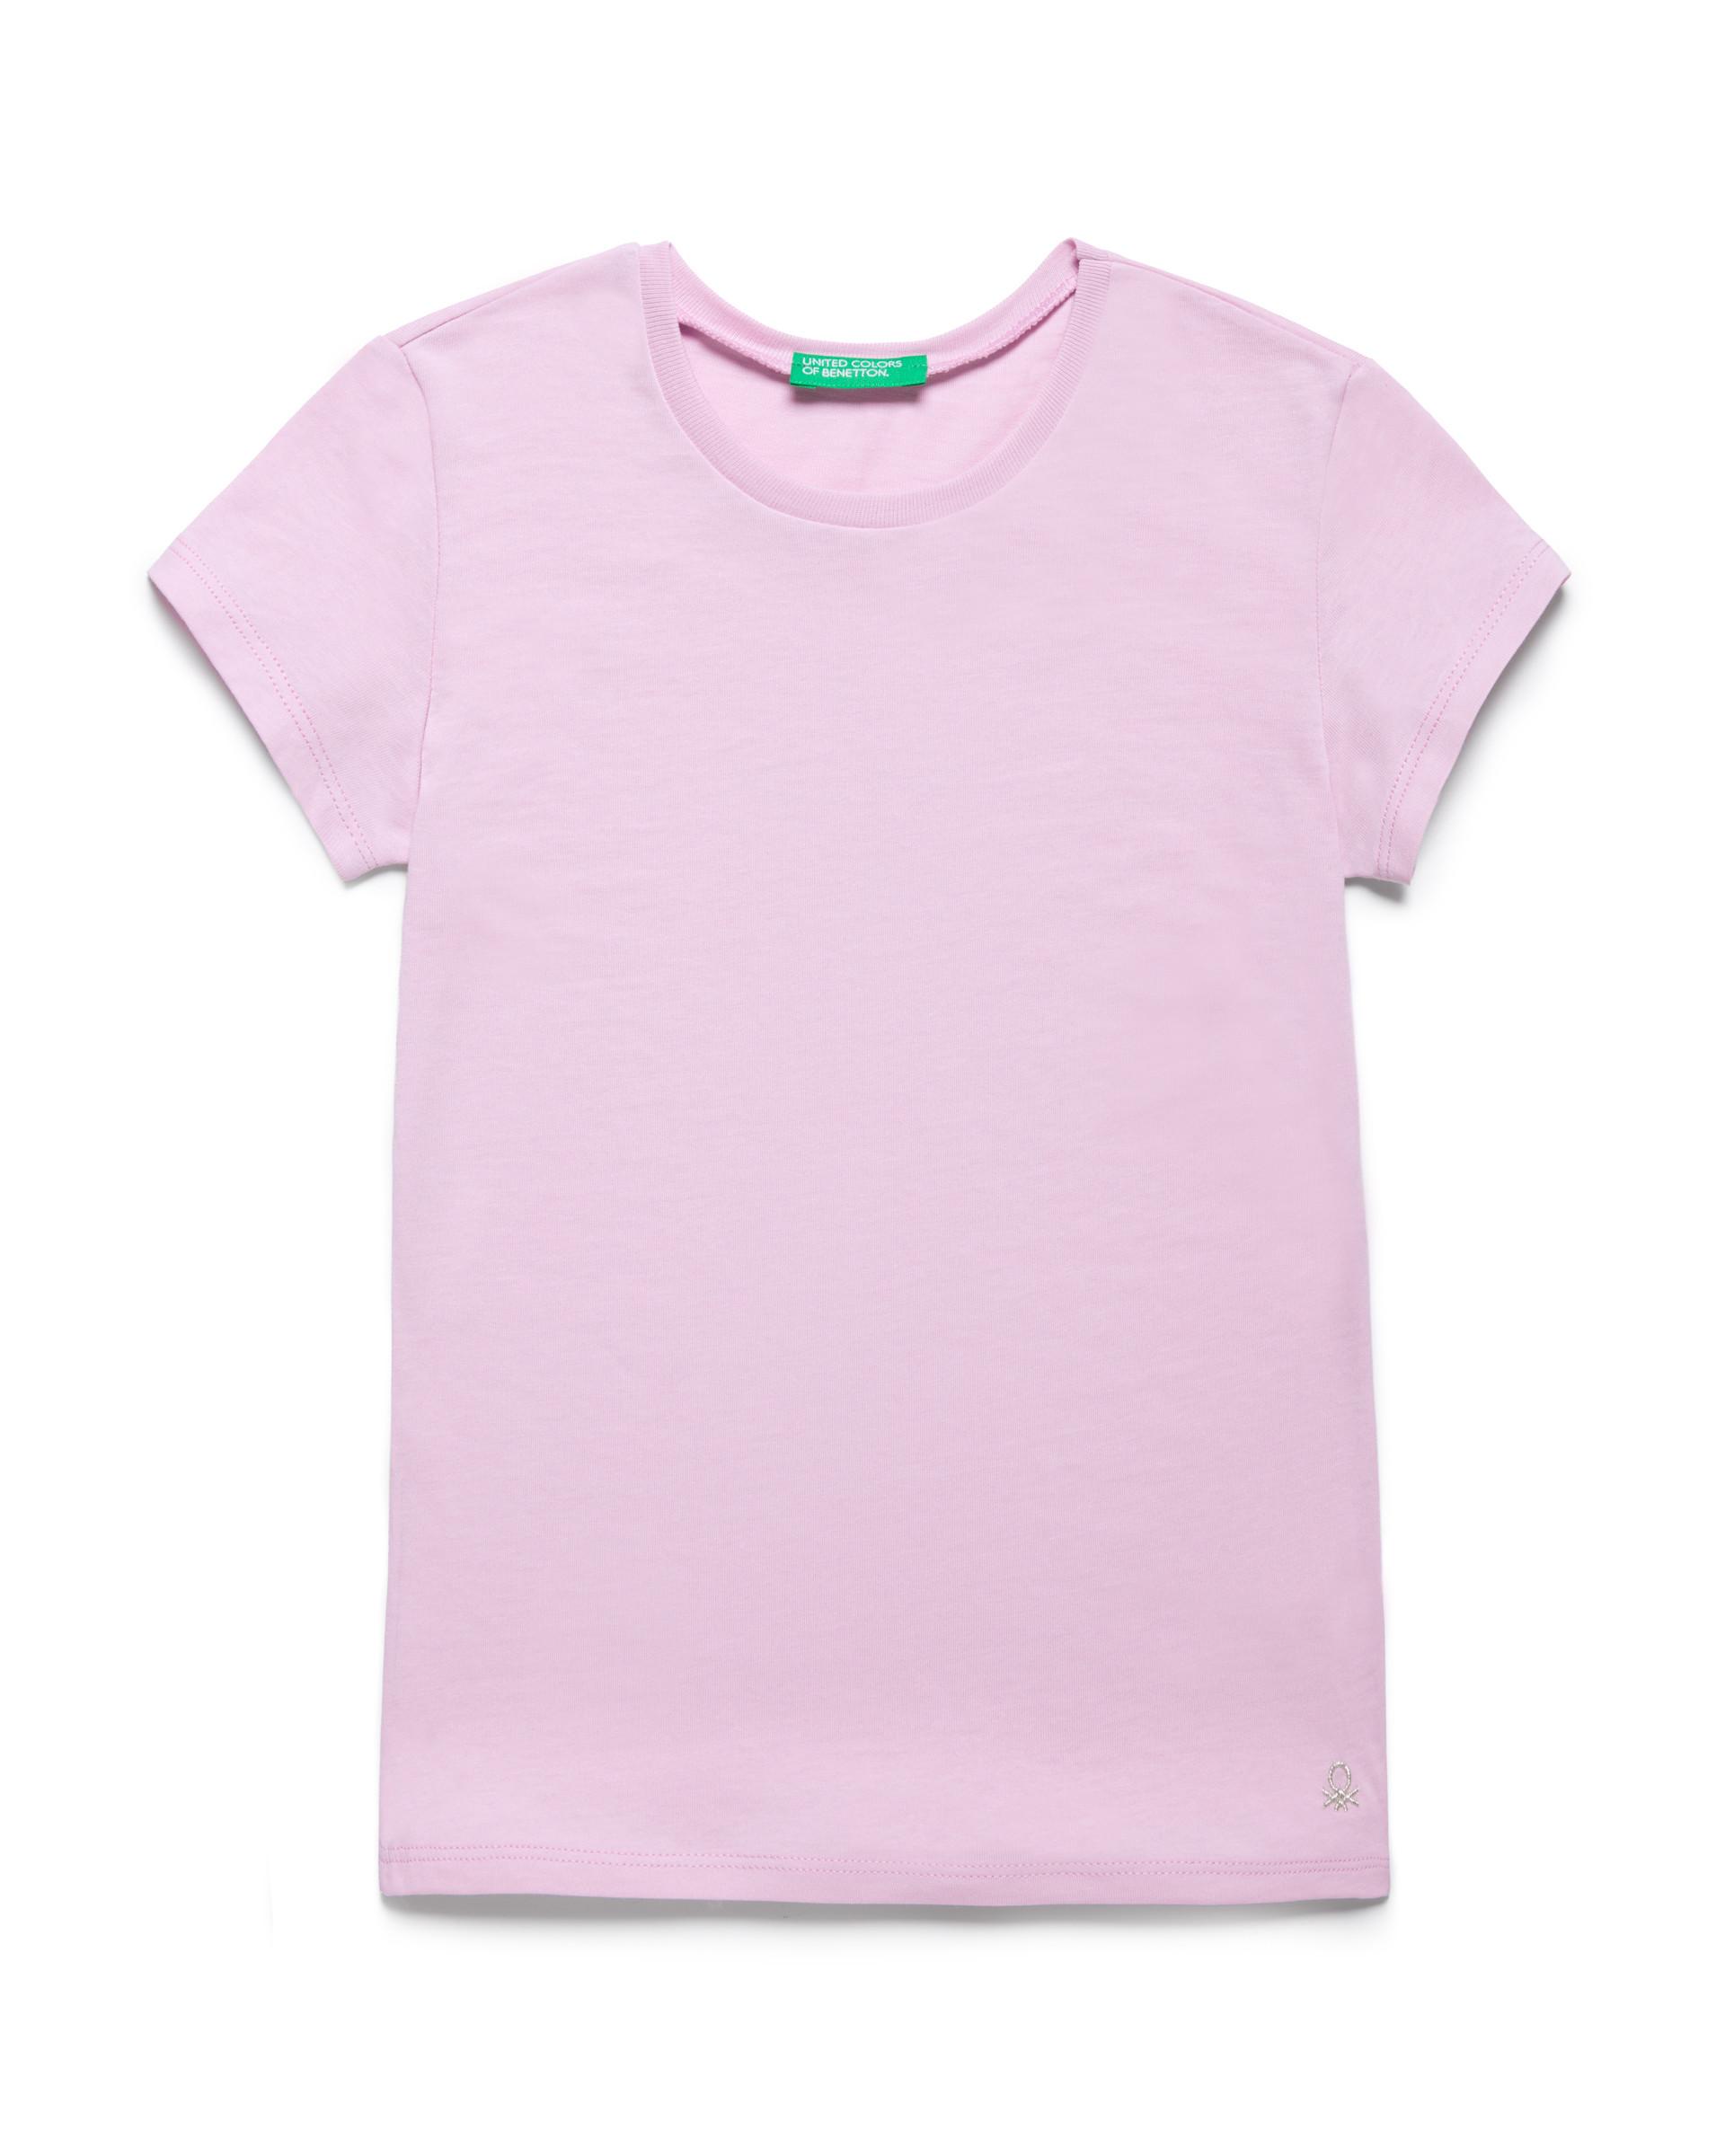 Купить 20P_3I1XC13J1_07M, Футболка для девочек Benetton 3I1XC13J1_07M р-р 122, United Colors of Benetton, Футболки для девочек